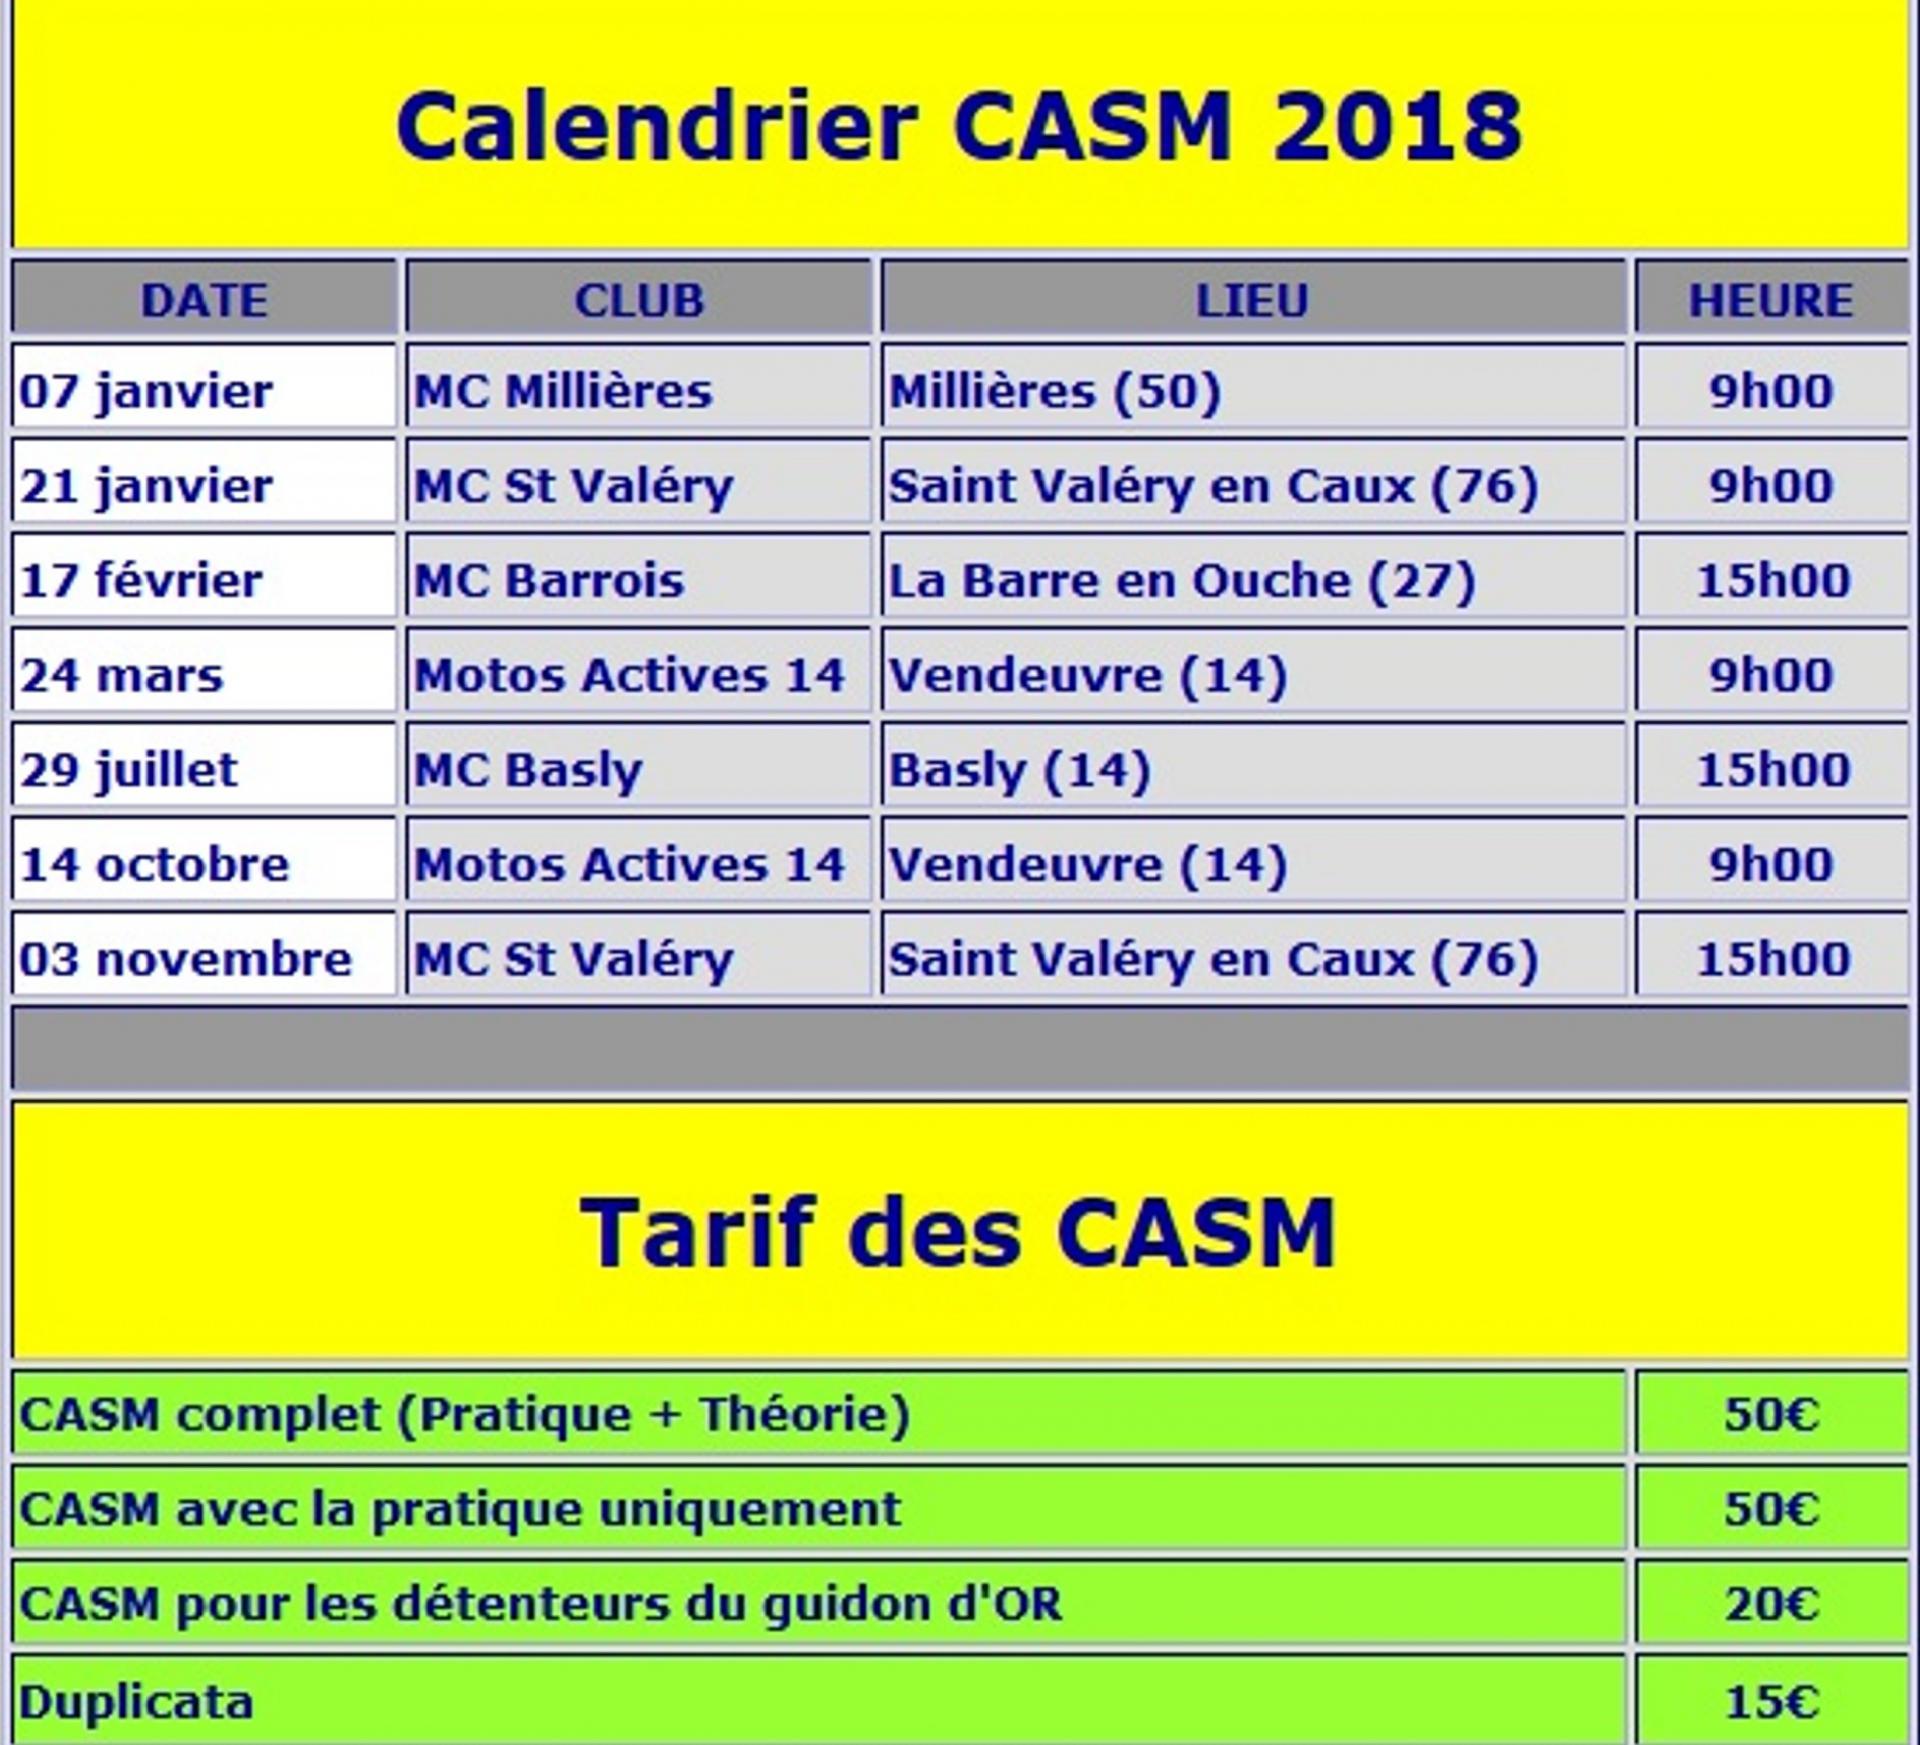 Calendrier CASM 2018 Normandie